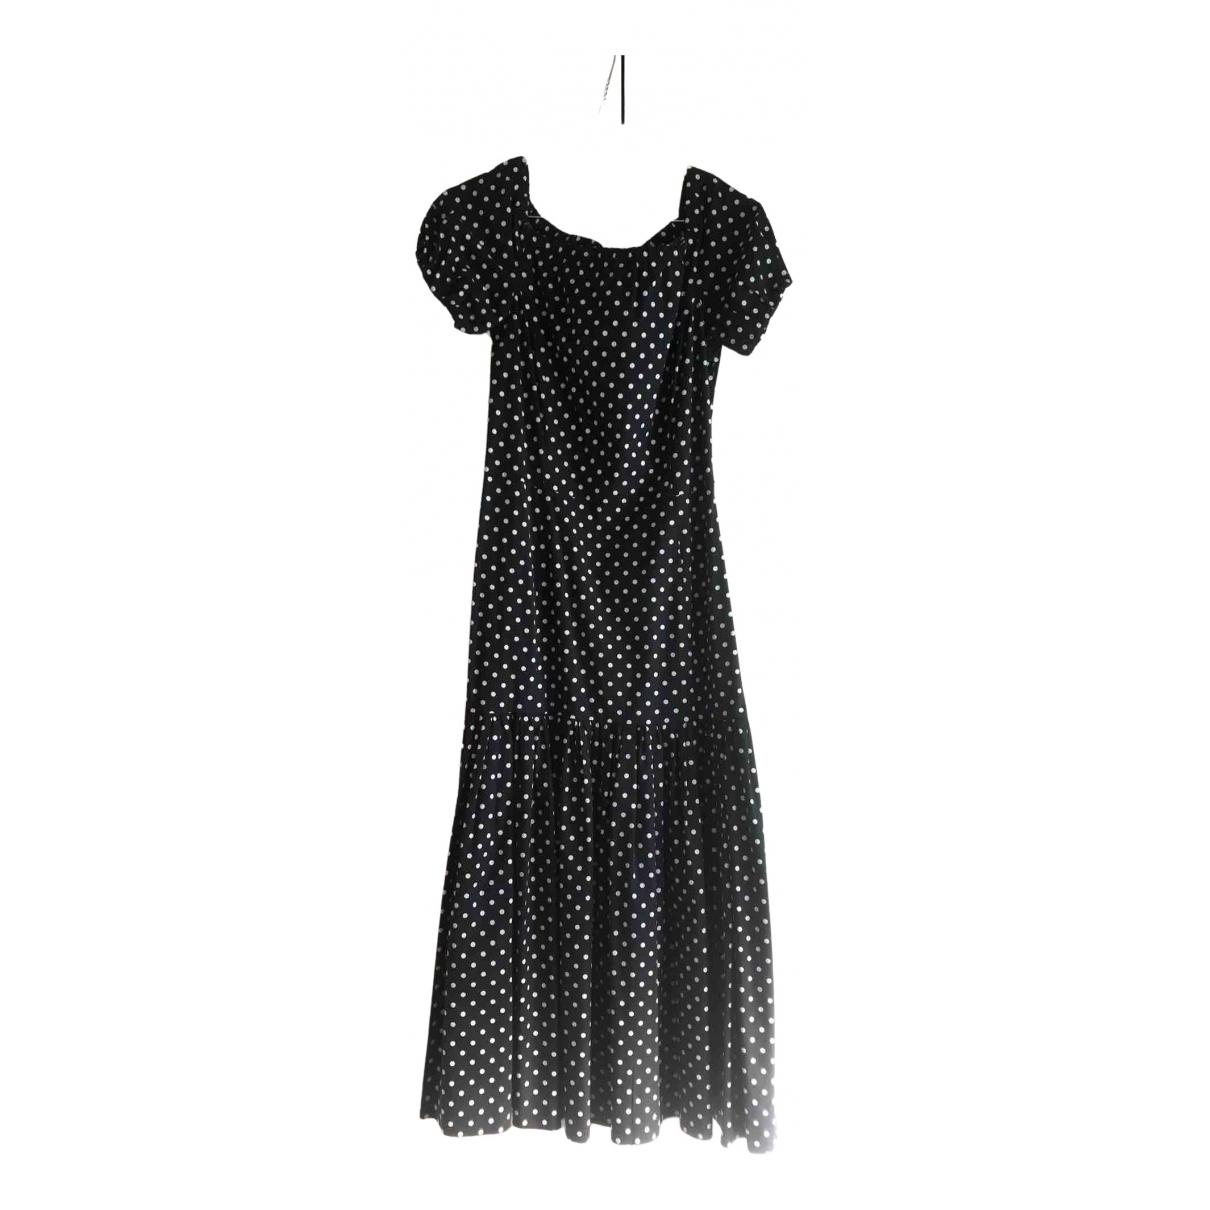 Prada \N Black Cotton dress for Women 36 FR